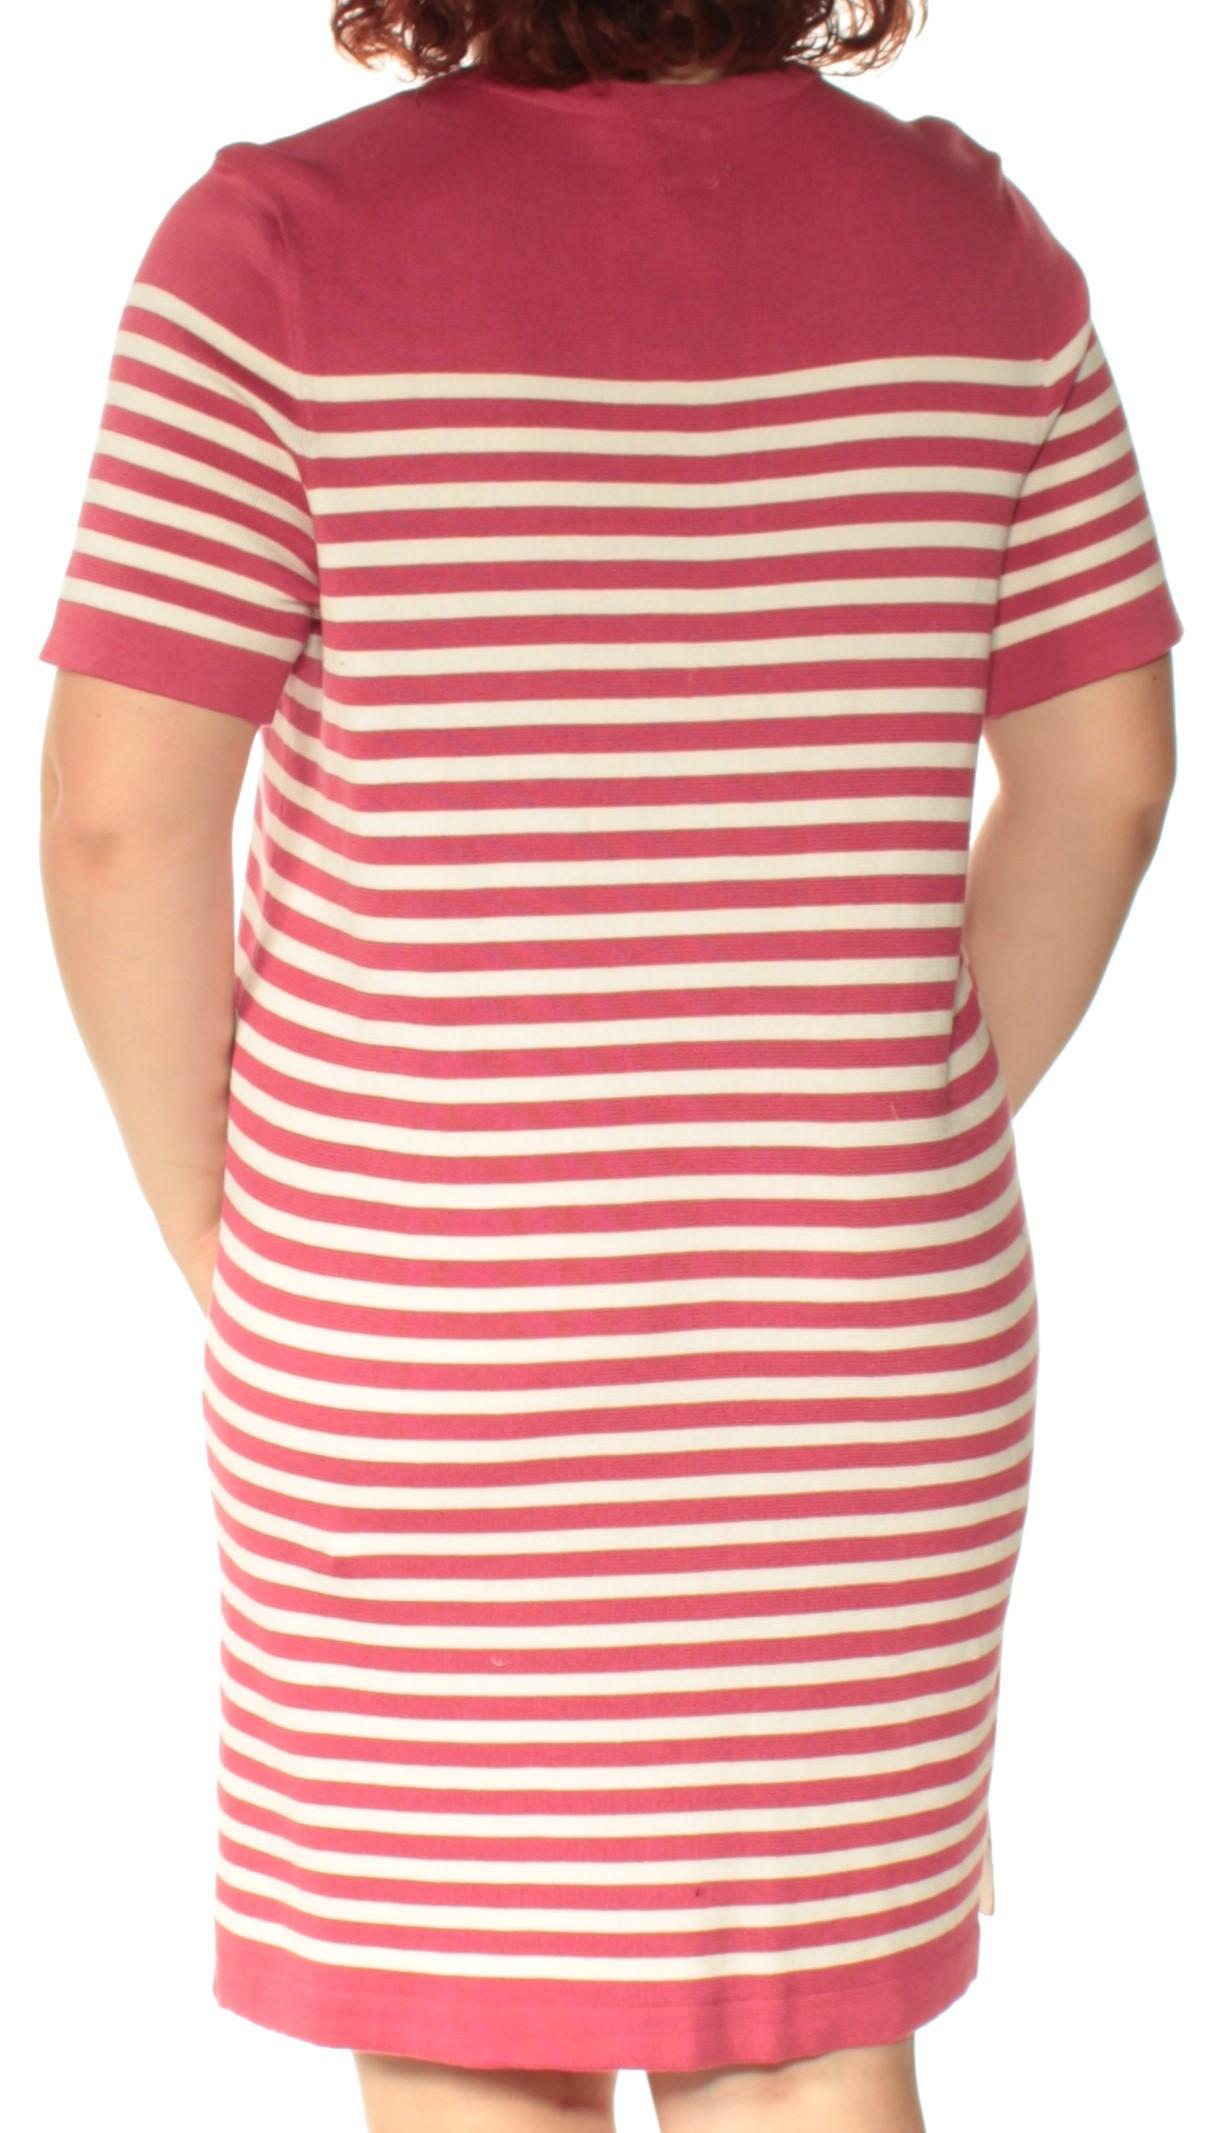 6d98f66d67 ANNE KLEIN  129 Womens New 1478 Pink Striped Short Sleeve Shift ...